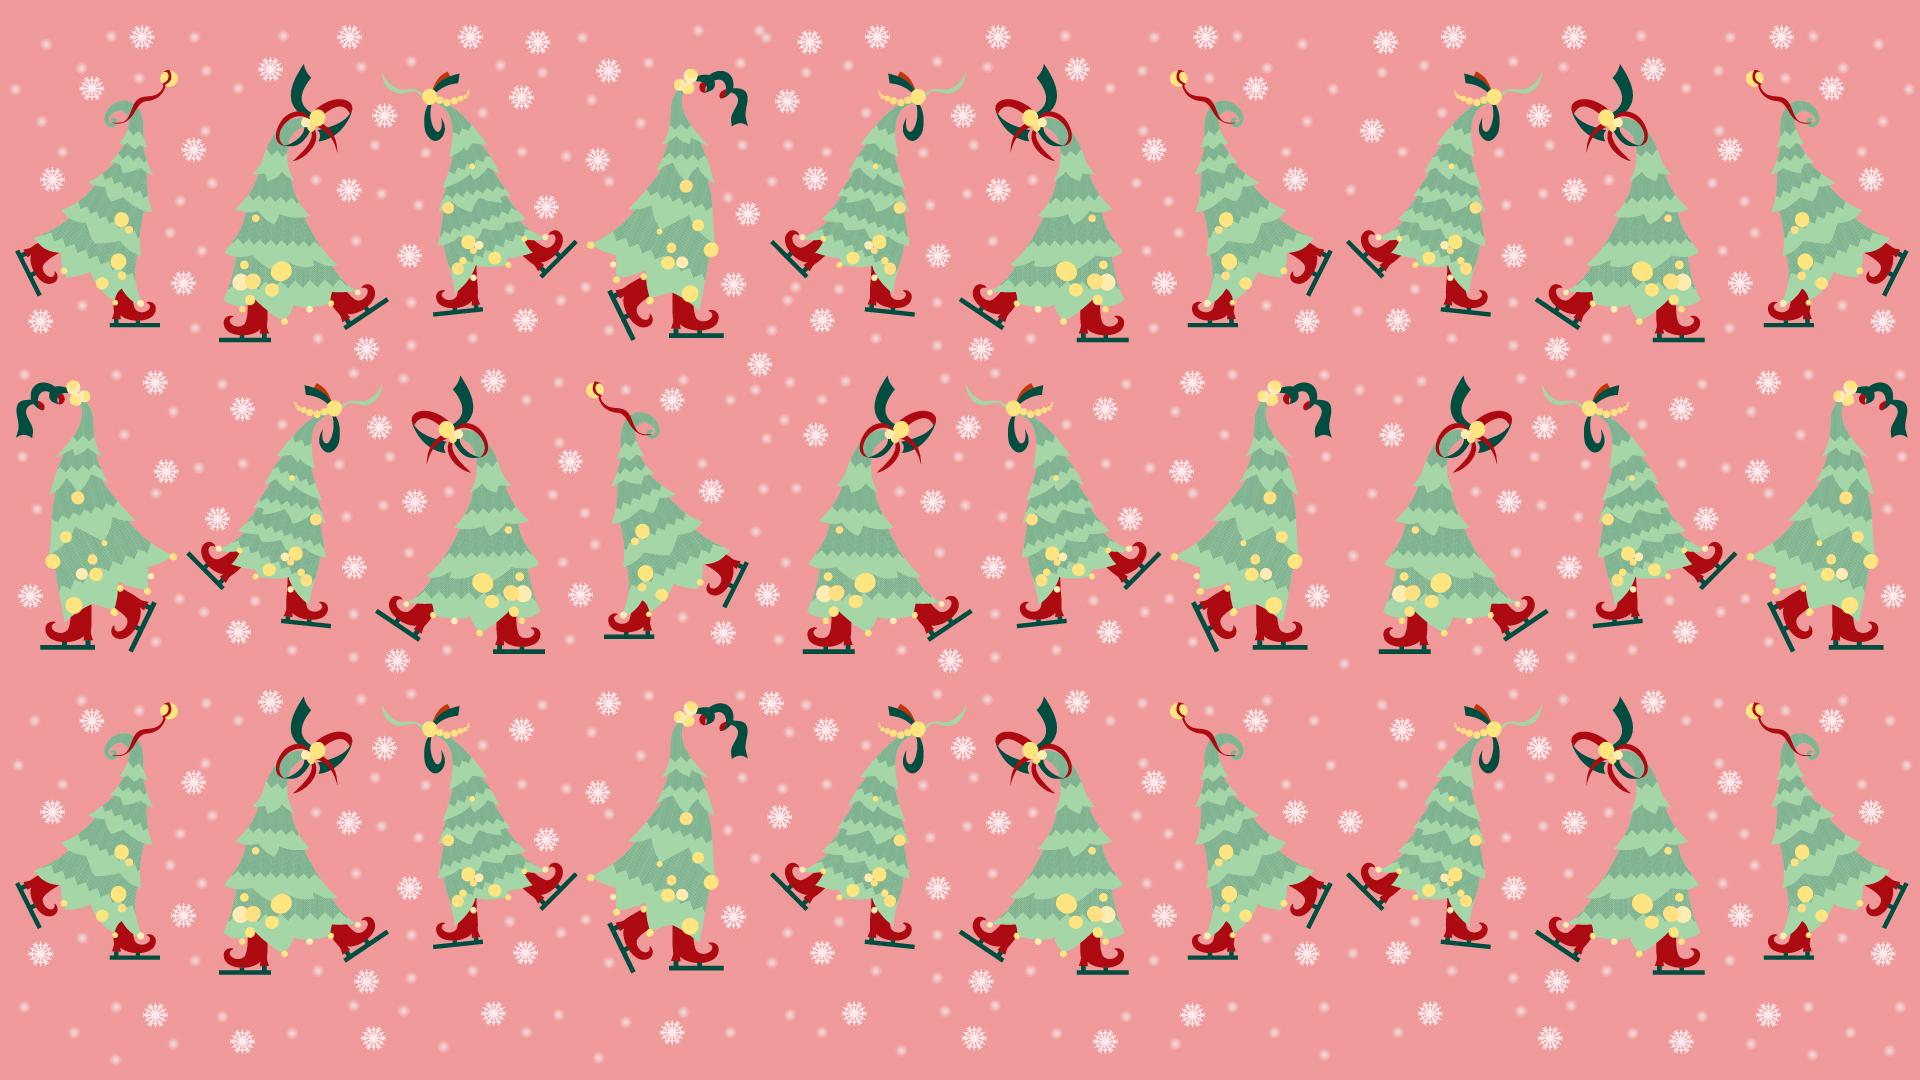 Laptop Christmas Wallpaper Source   Cute Christmas Wallpaper 1920x1080